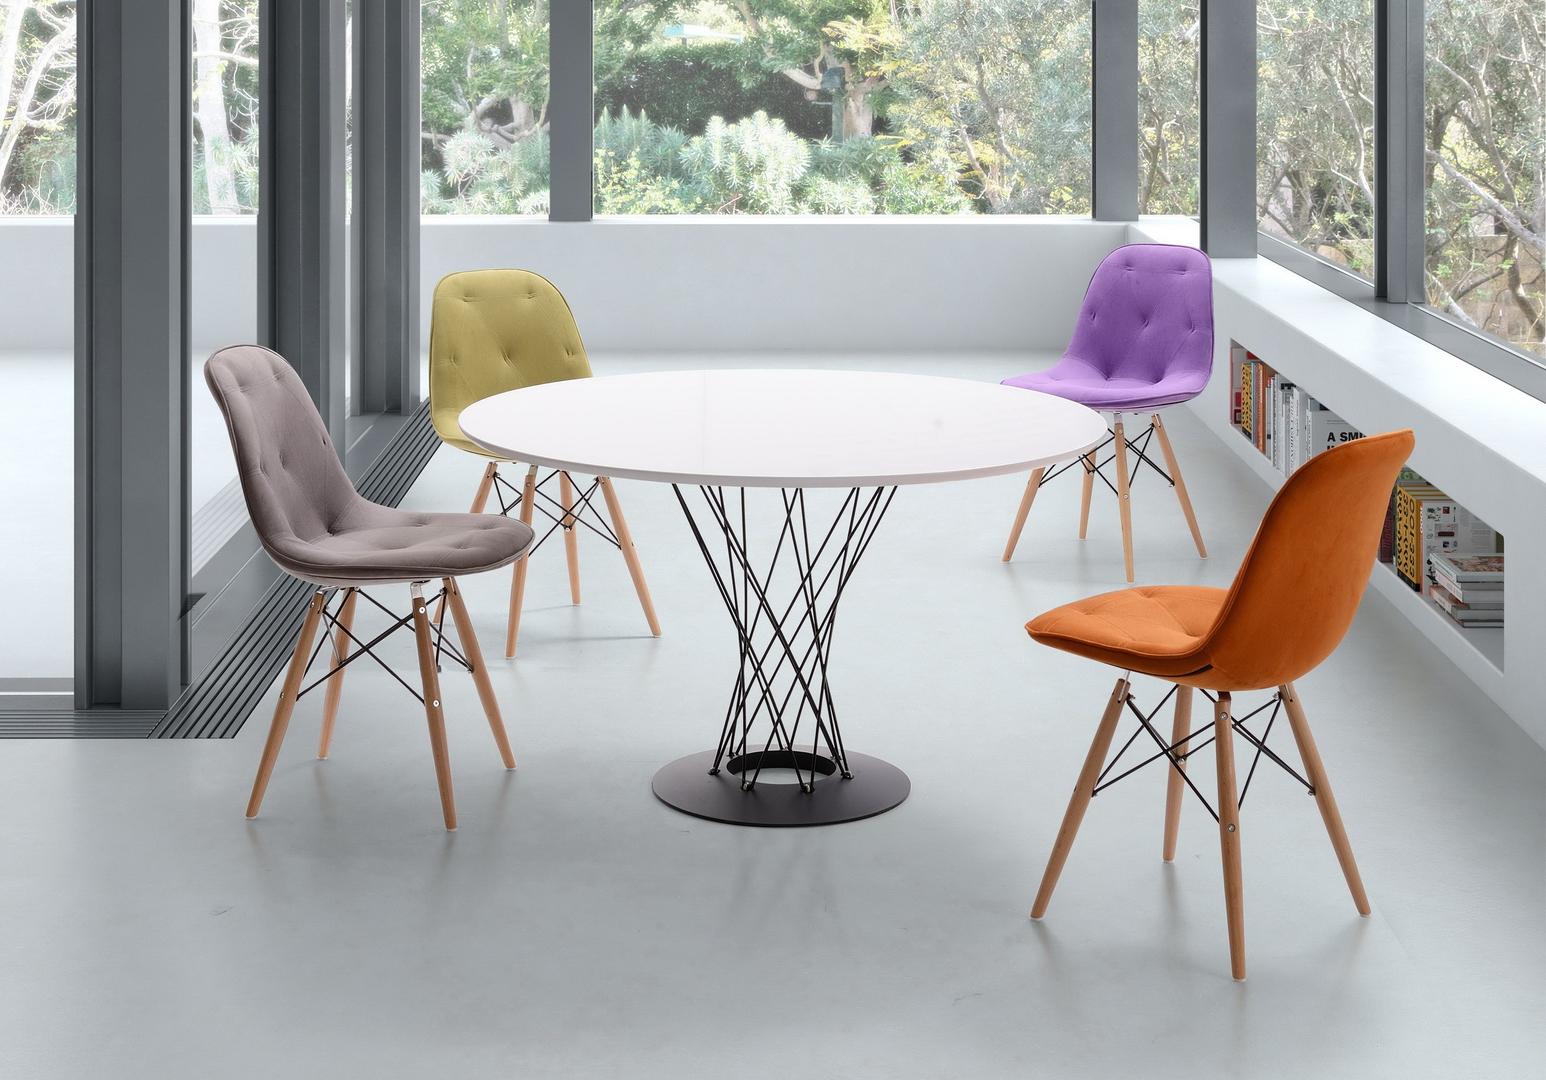 Groovy Mikga Restaurant Furniture Metal Dining Chair Metal Bar Stool Andrewgaddart Wooden Chair Designs For Living Room Andrewgaddartcom